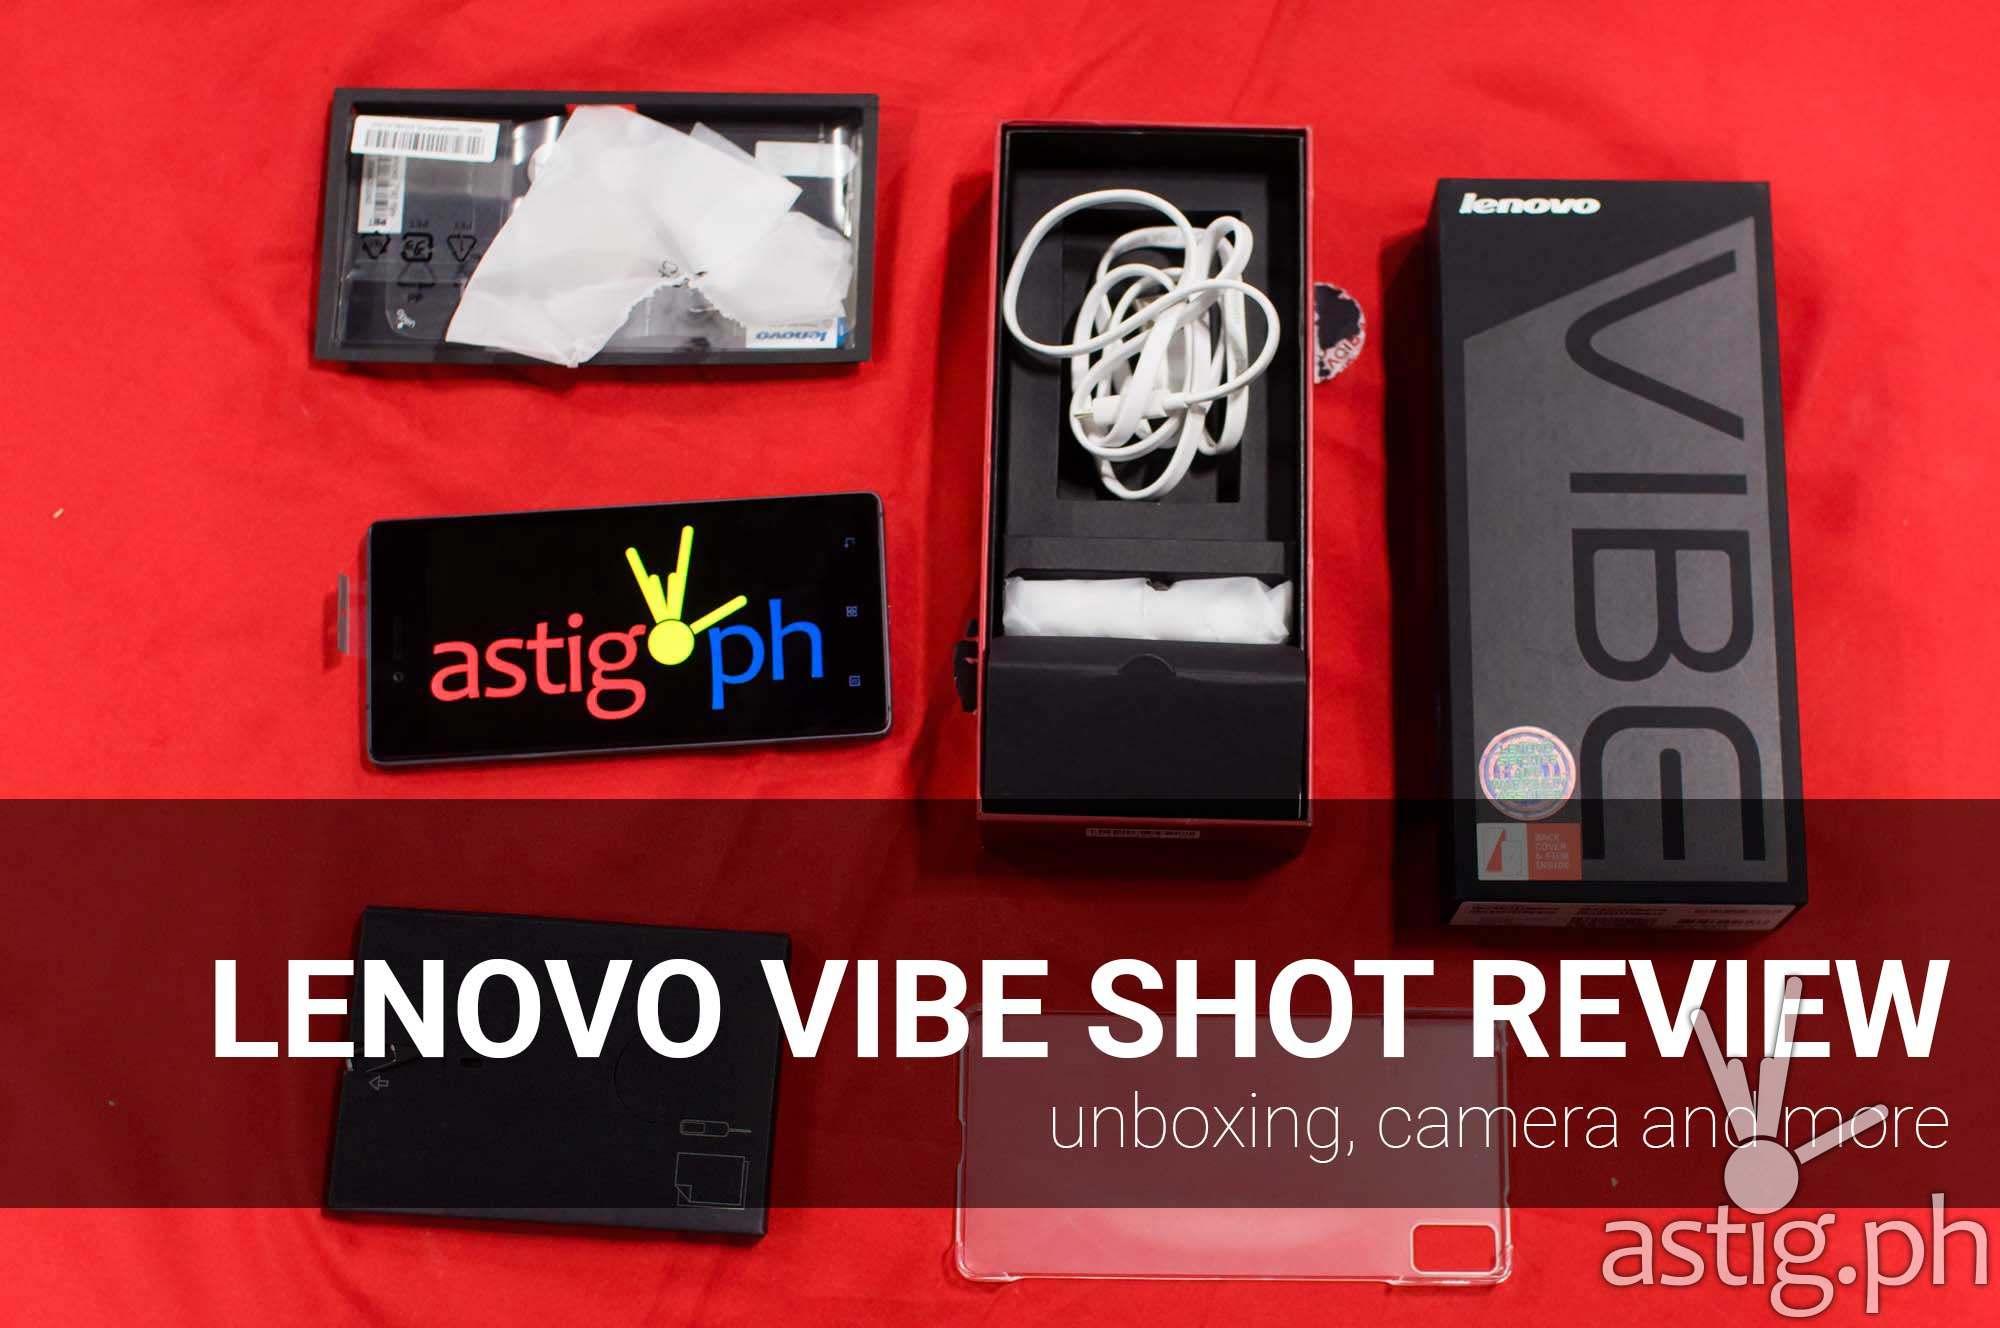 Lenovo VIBE Shot review unboxing [video] | ASTIG PH